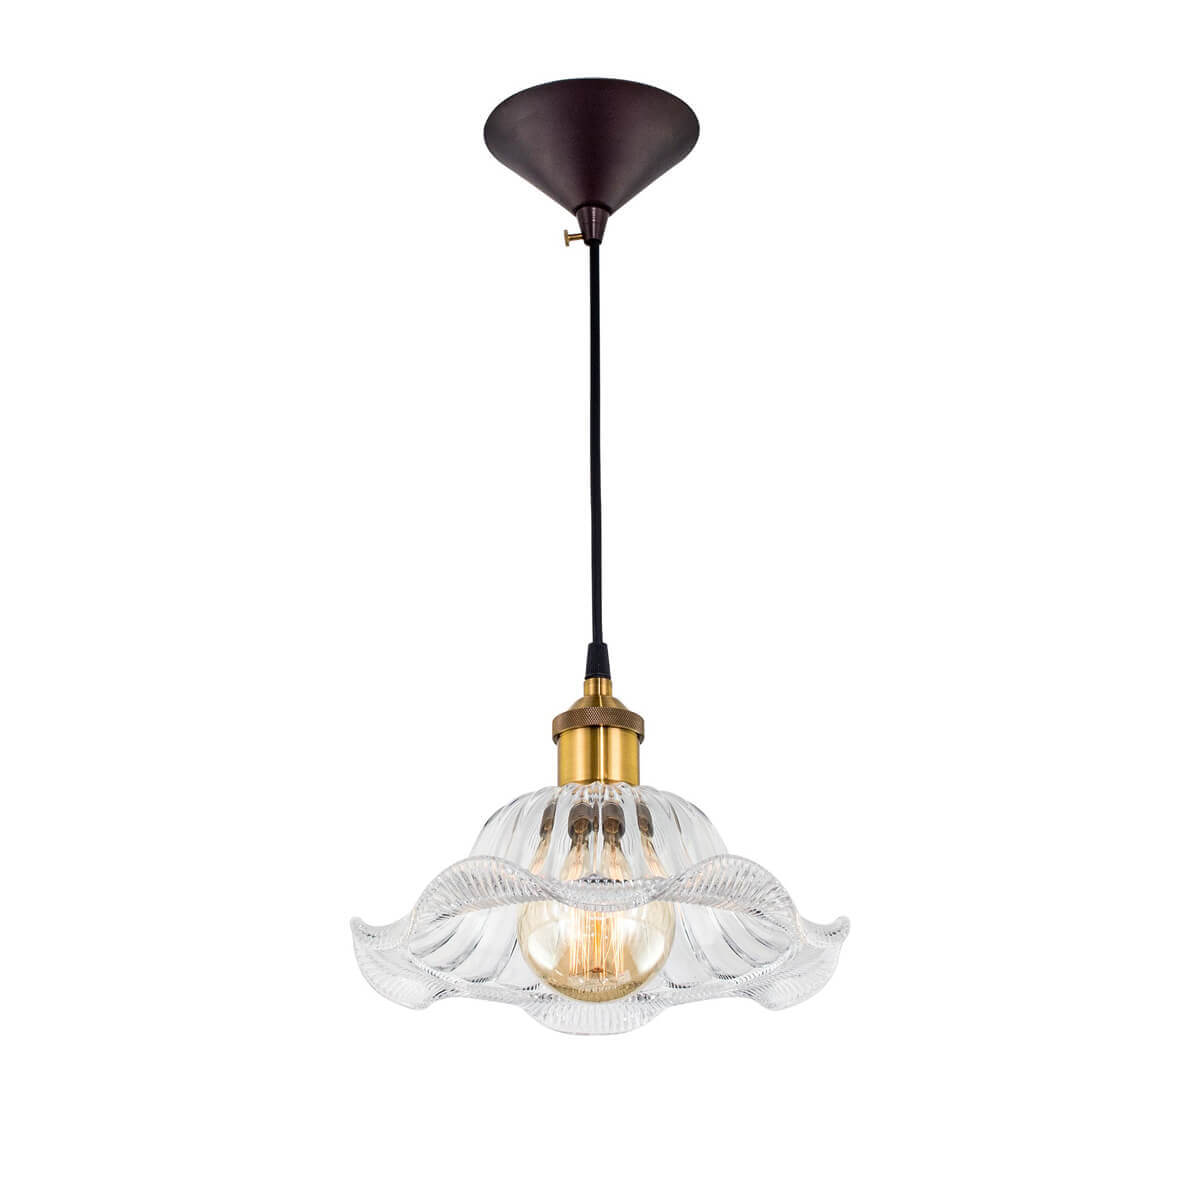 цена на Светильник Citilux CL450105 Эдисон